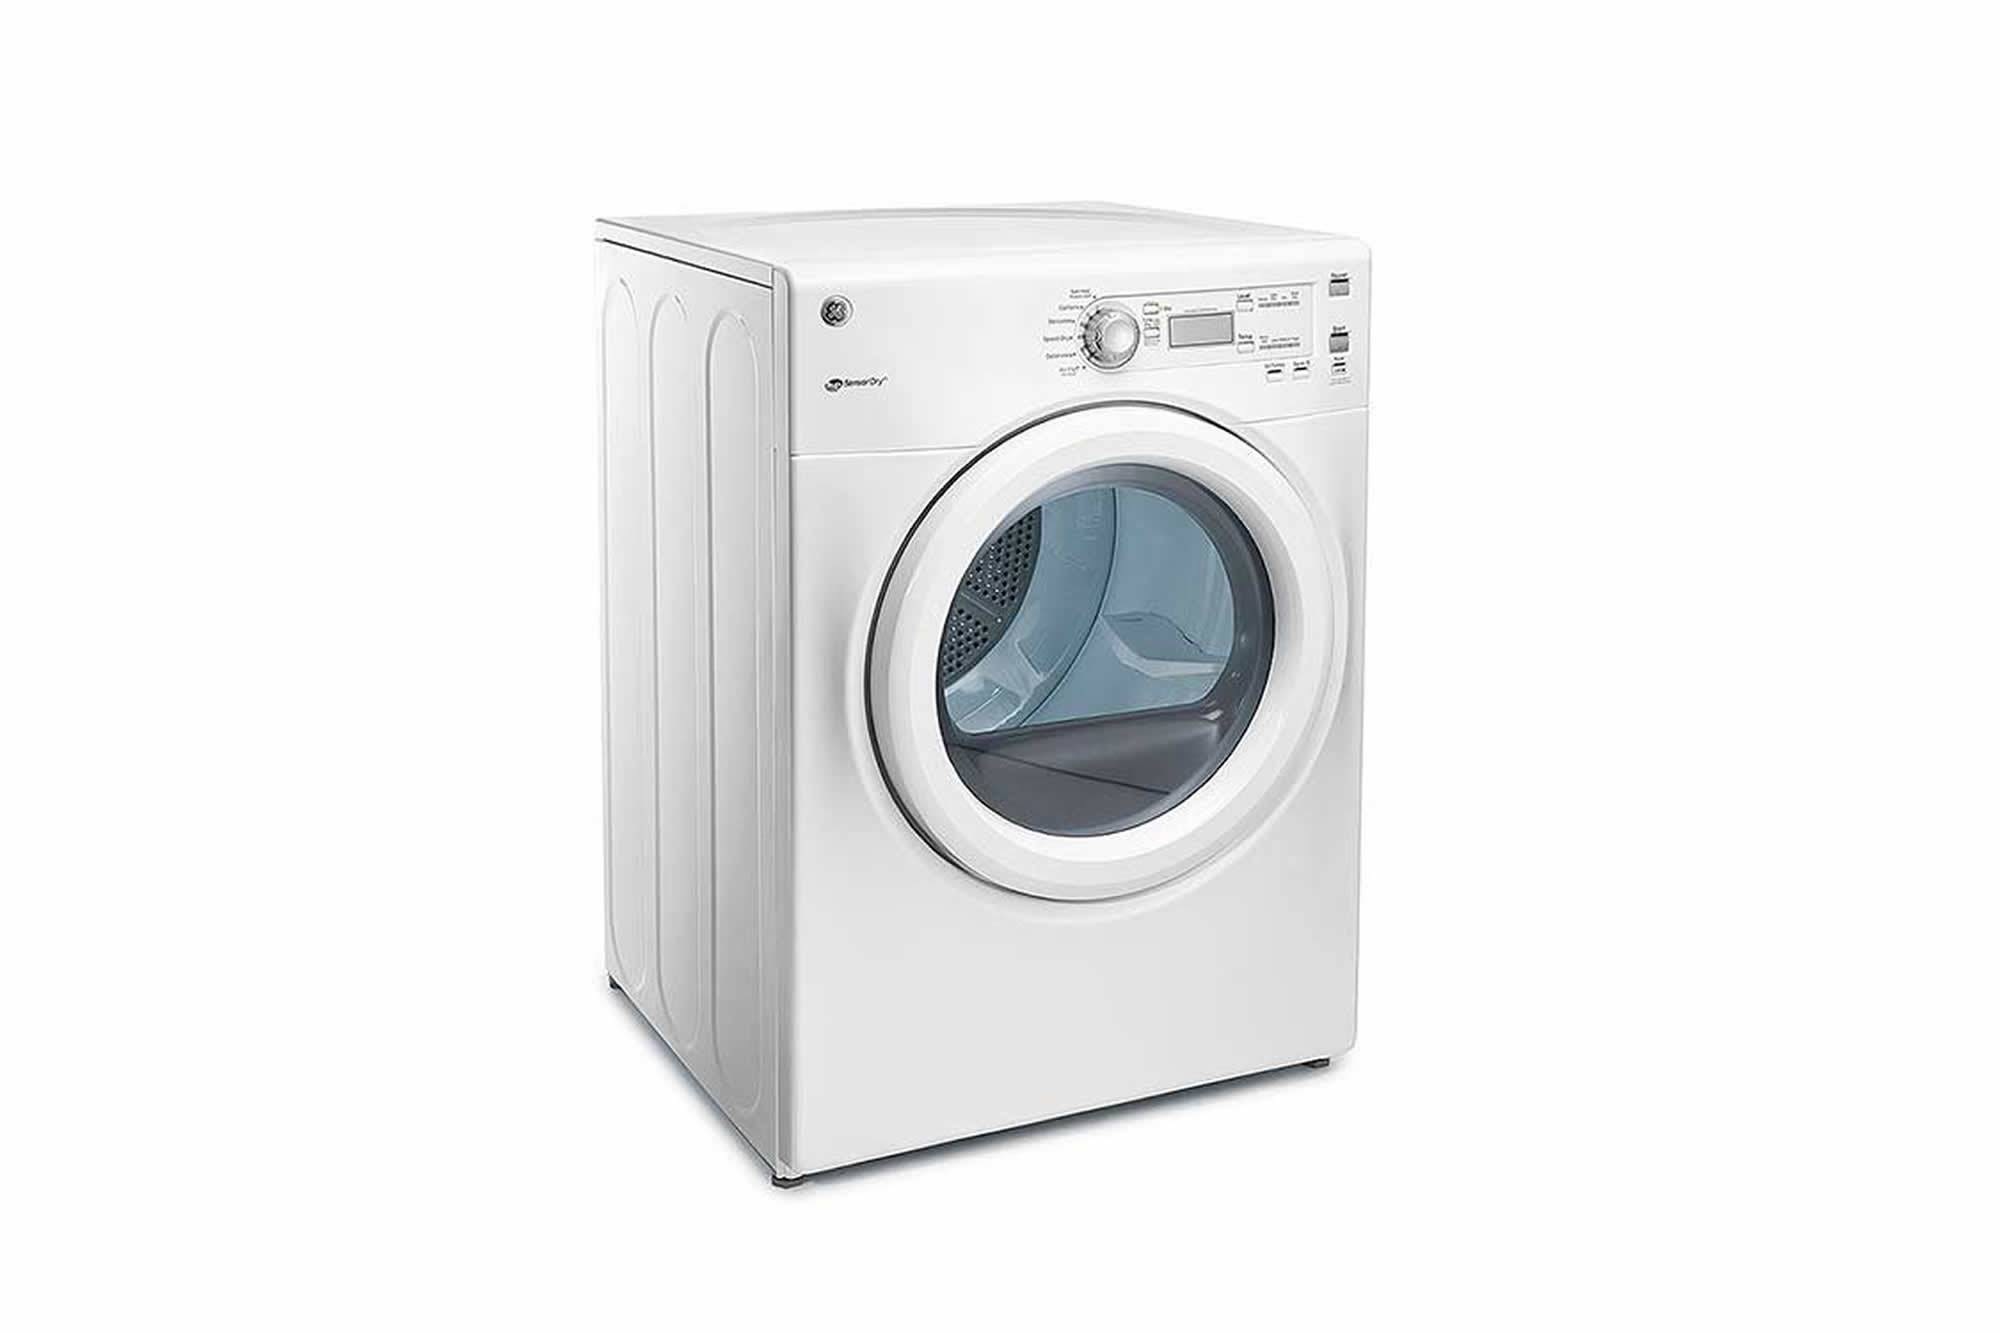 lavadoras white westinghouse